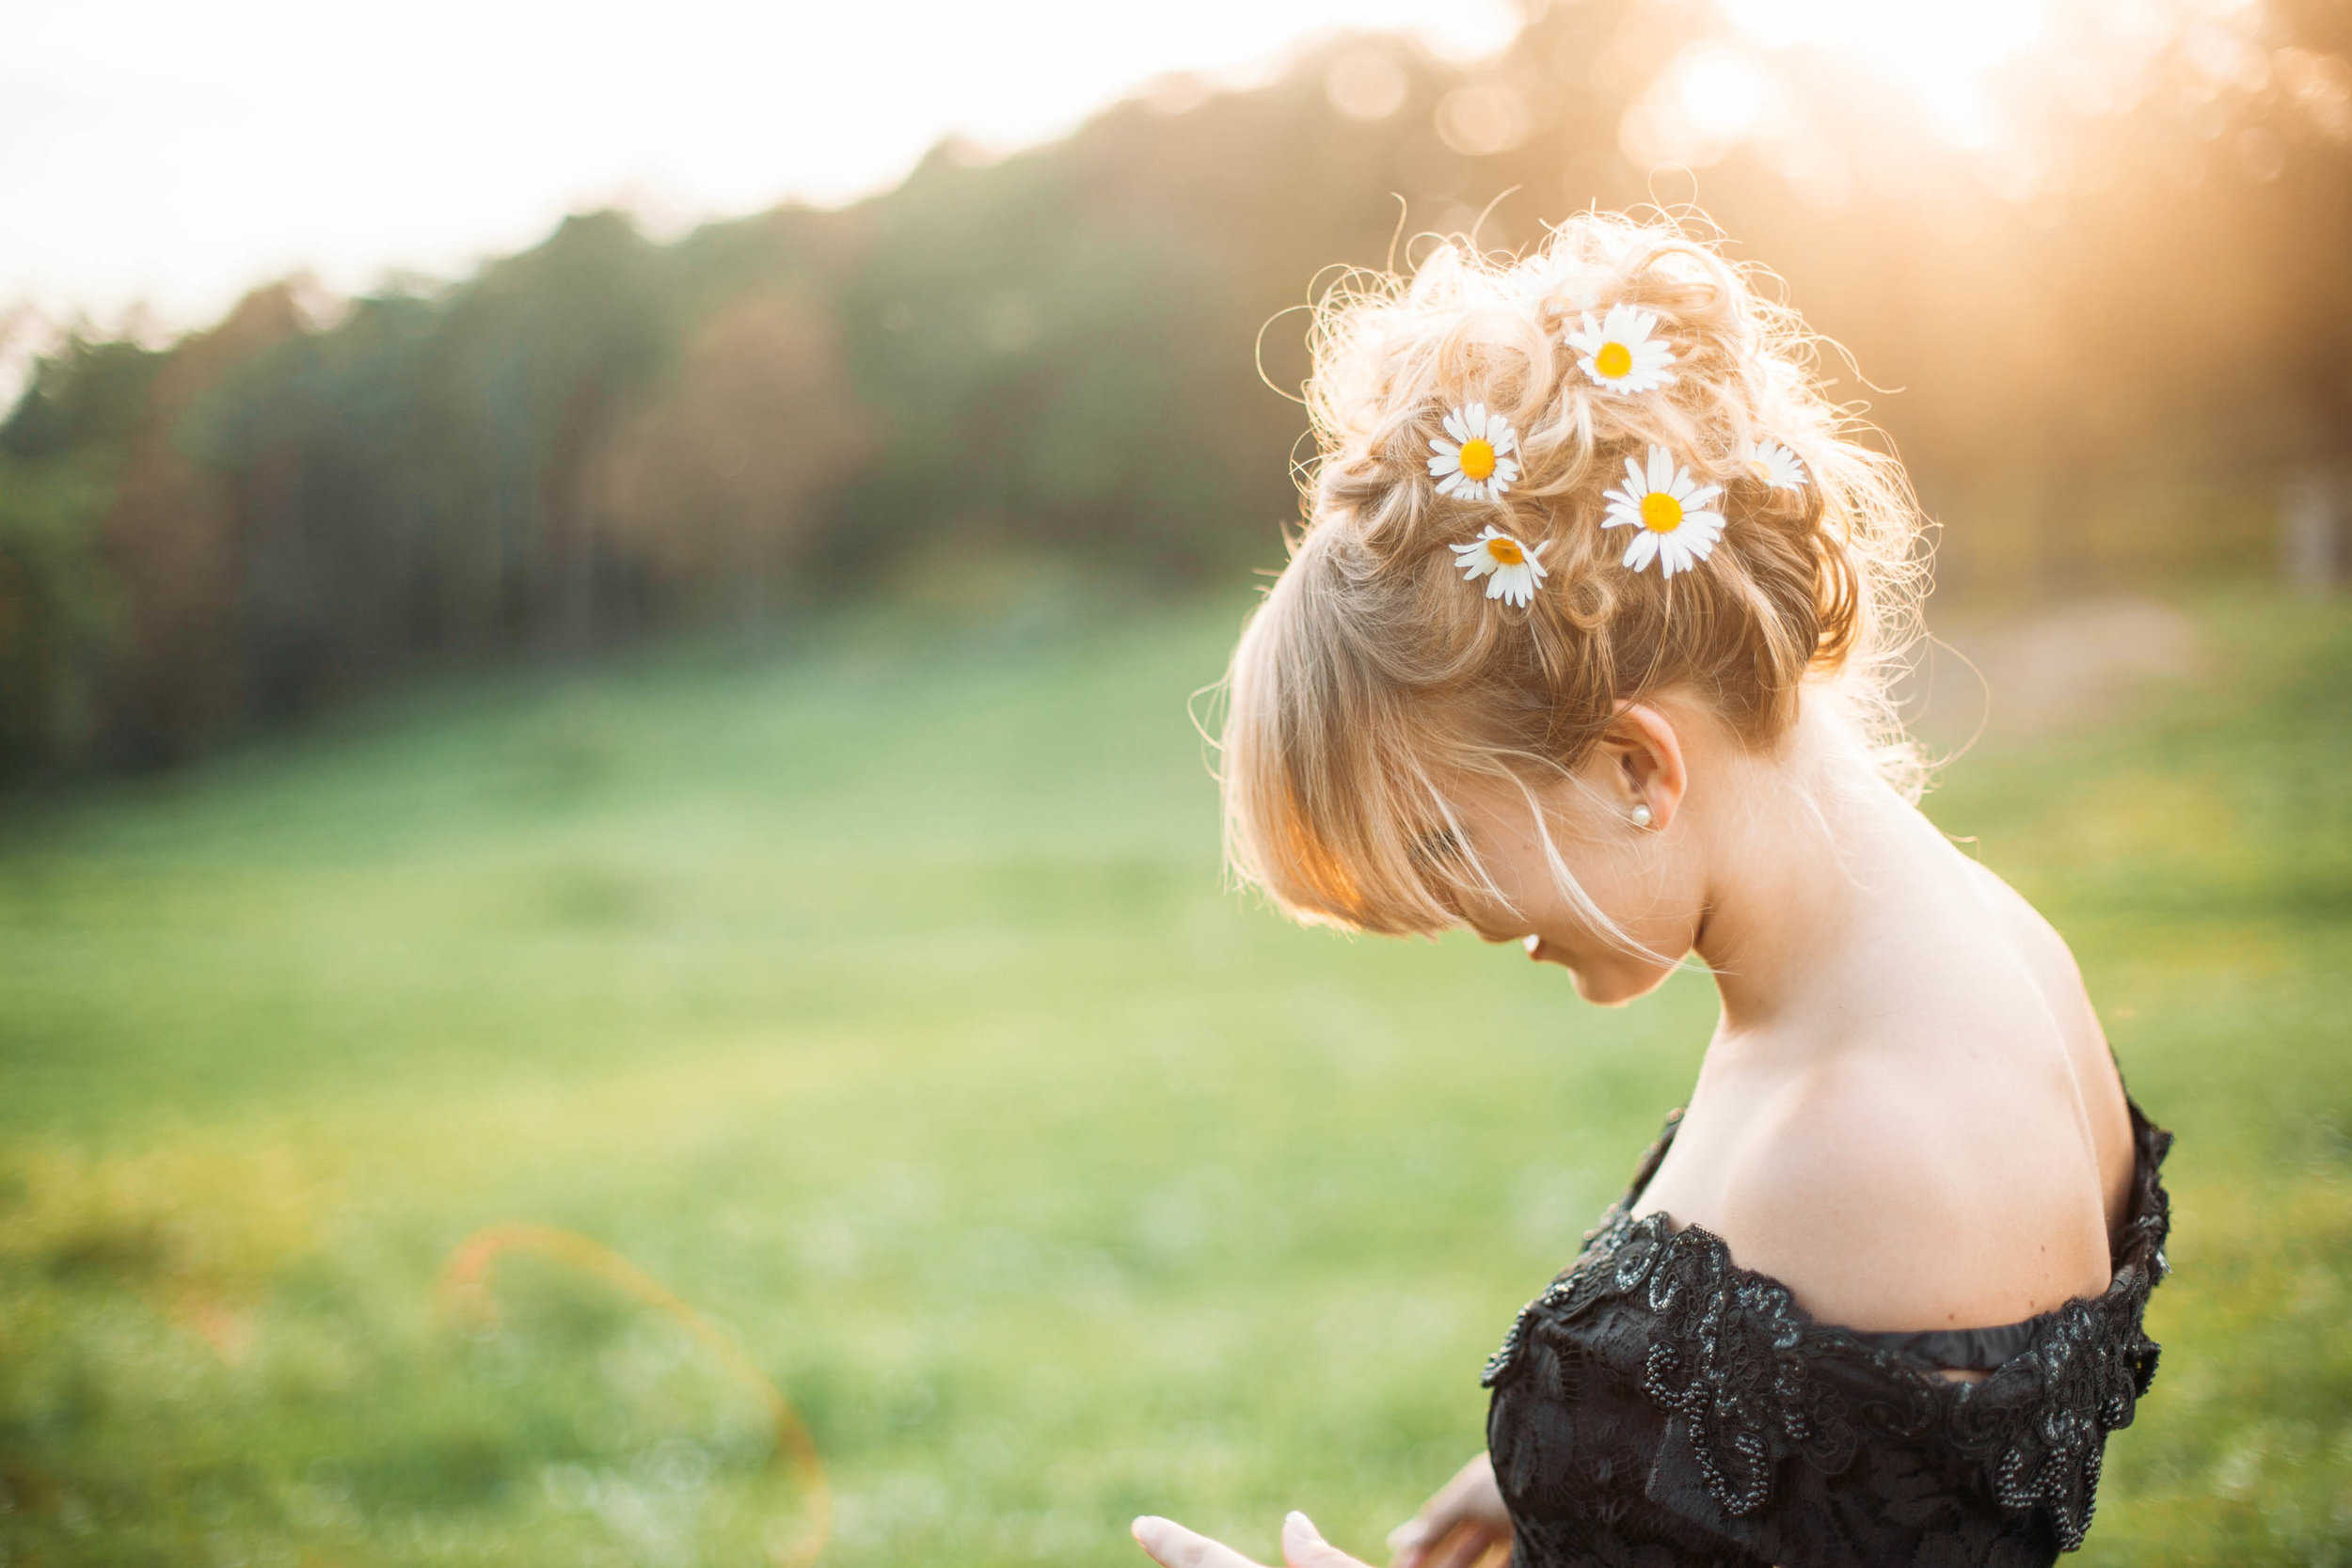 Senior-Portrait-Photographer-Senior-Pictures-Morgan-Flowers-in-Hair_1.jpg